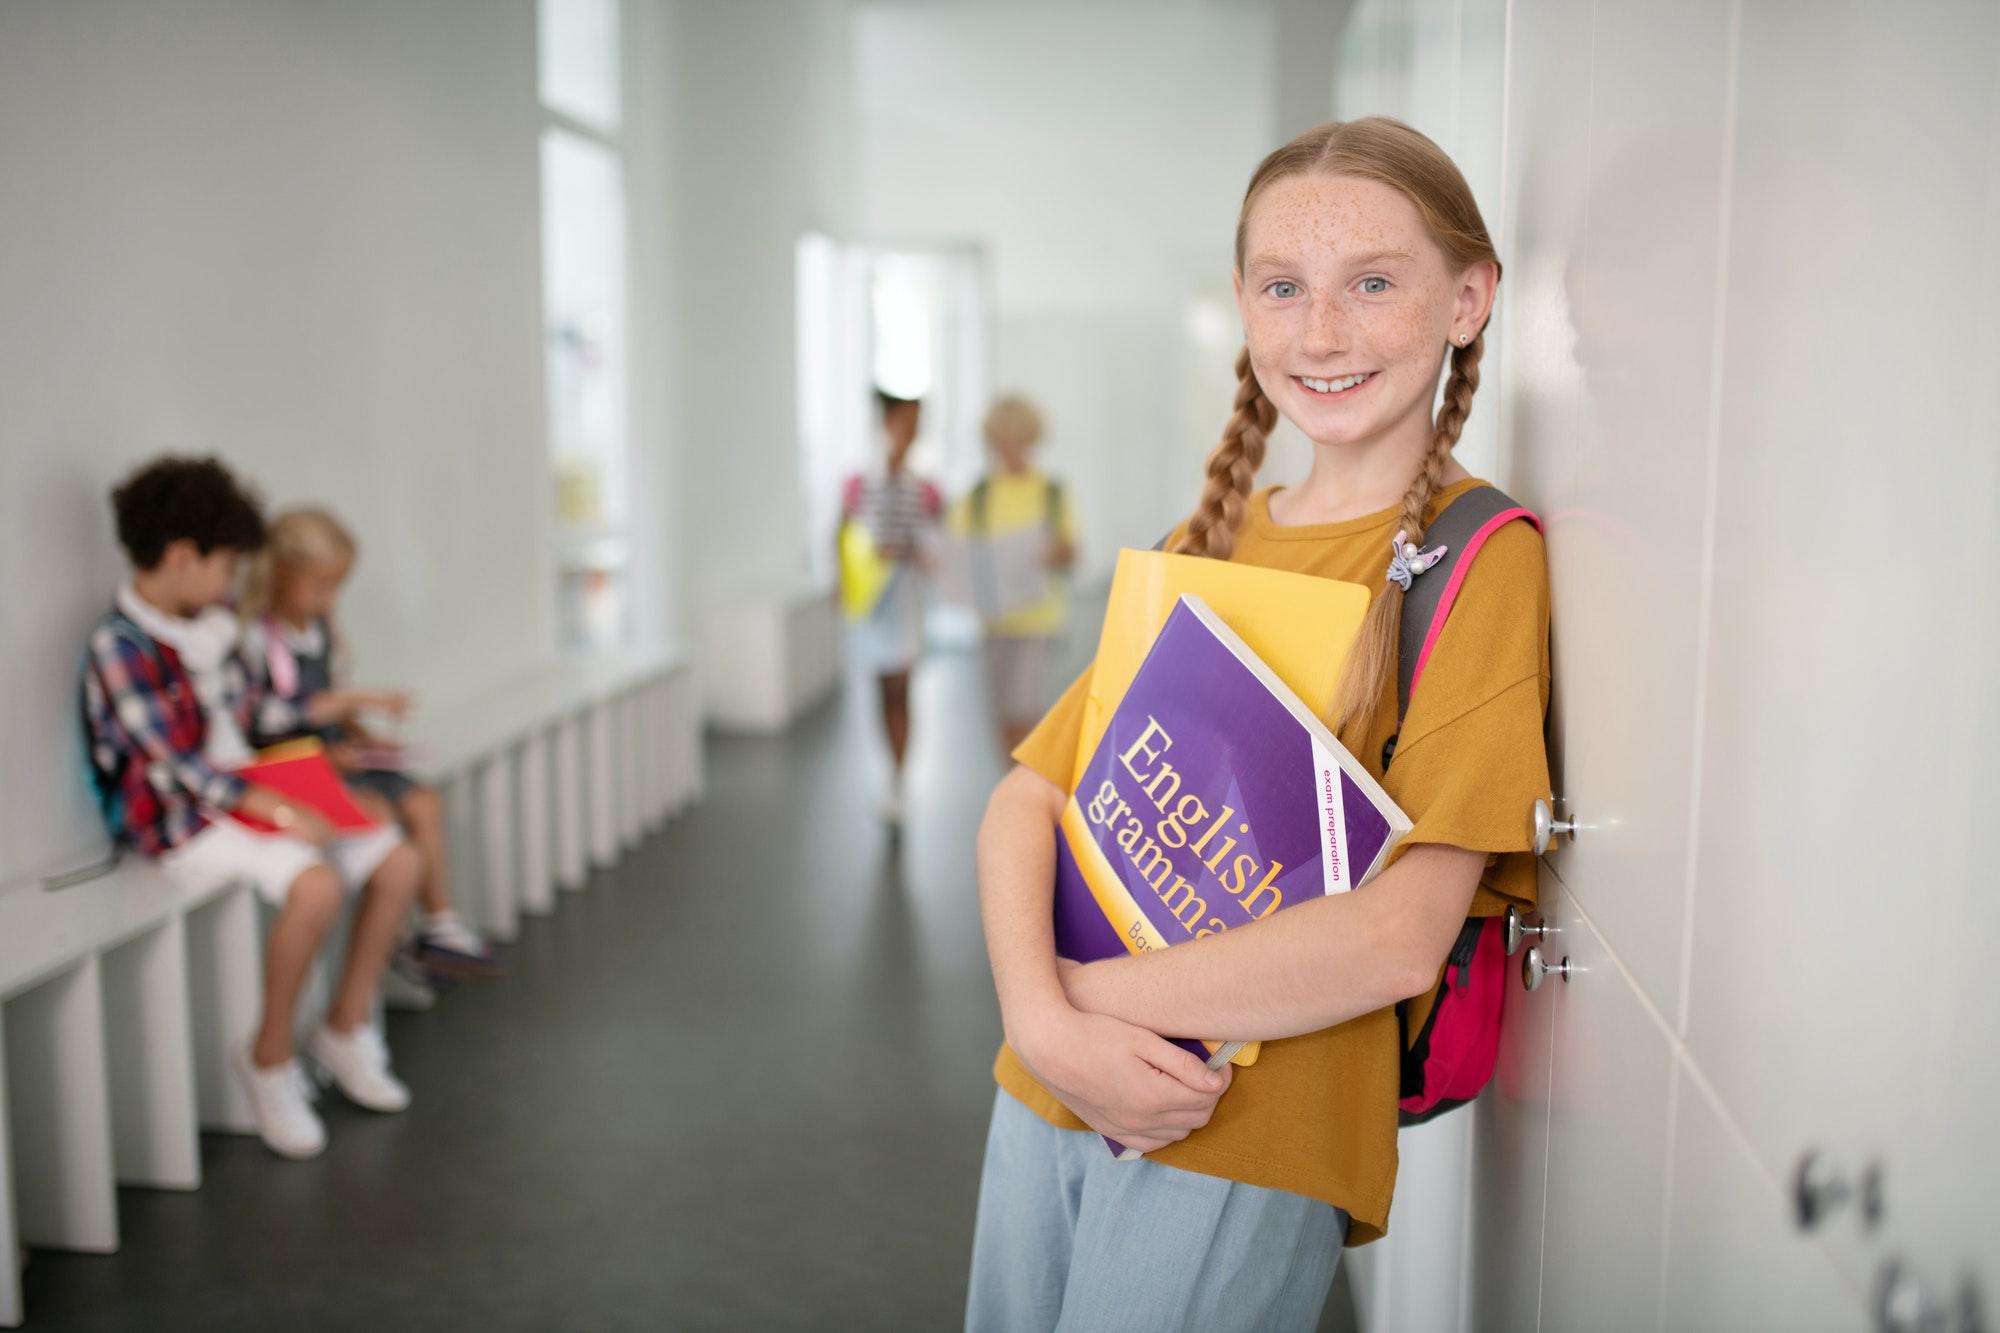 Beautiful schoolgirl holding boy while standing near locker